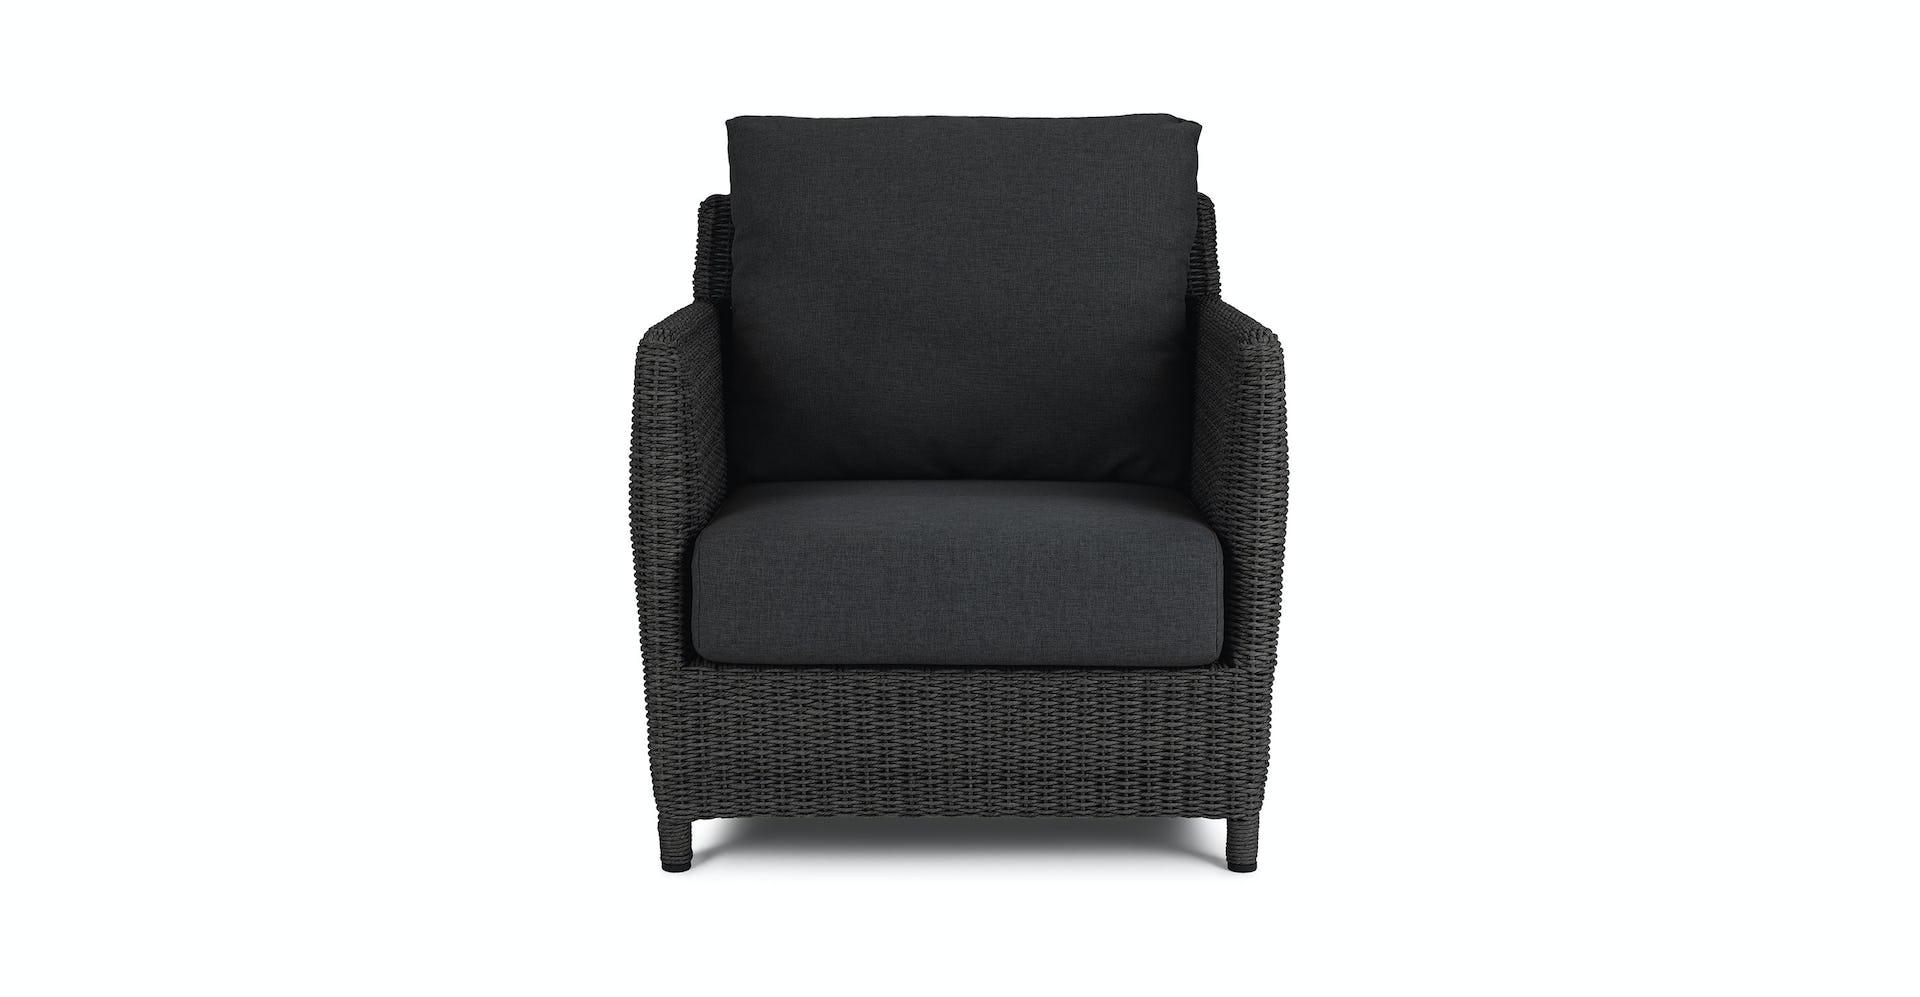 Incredible Calo Onyx Black Lounge Chair Customarchery Wood Chair Design Ideas Customarcherynet